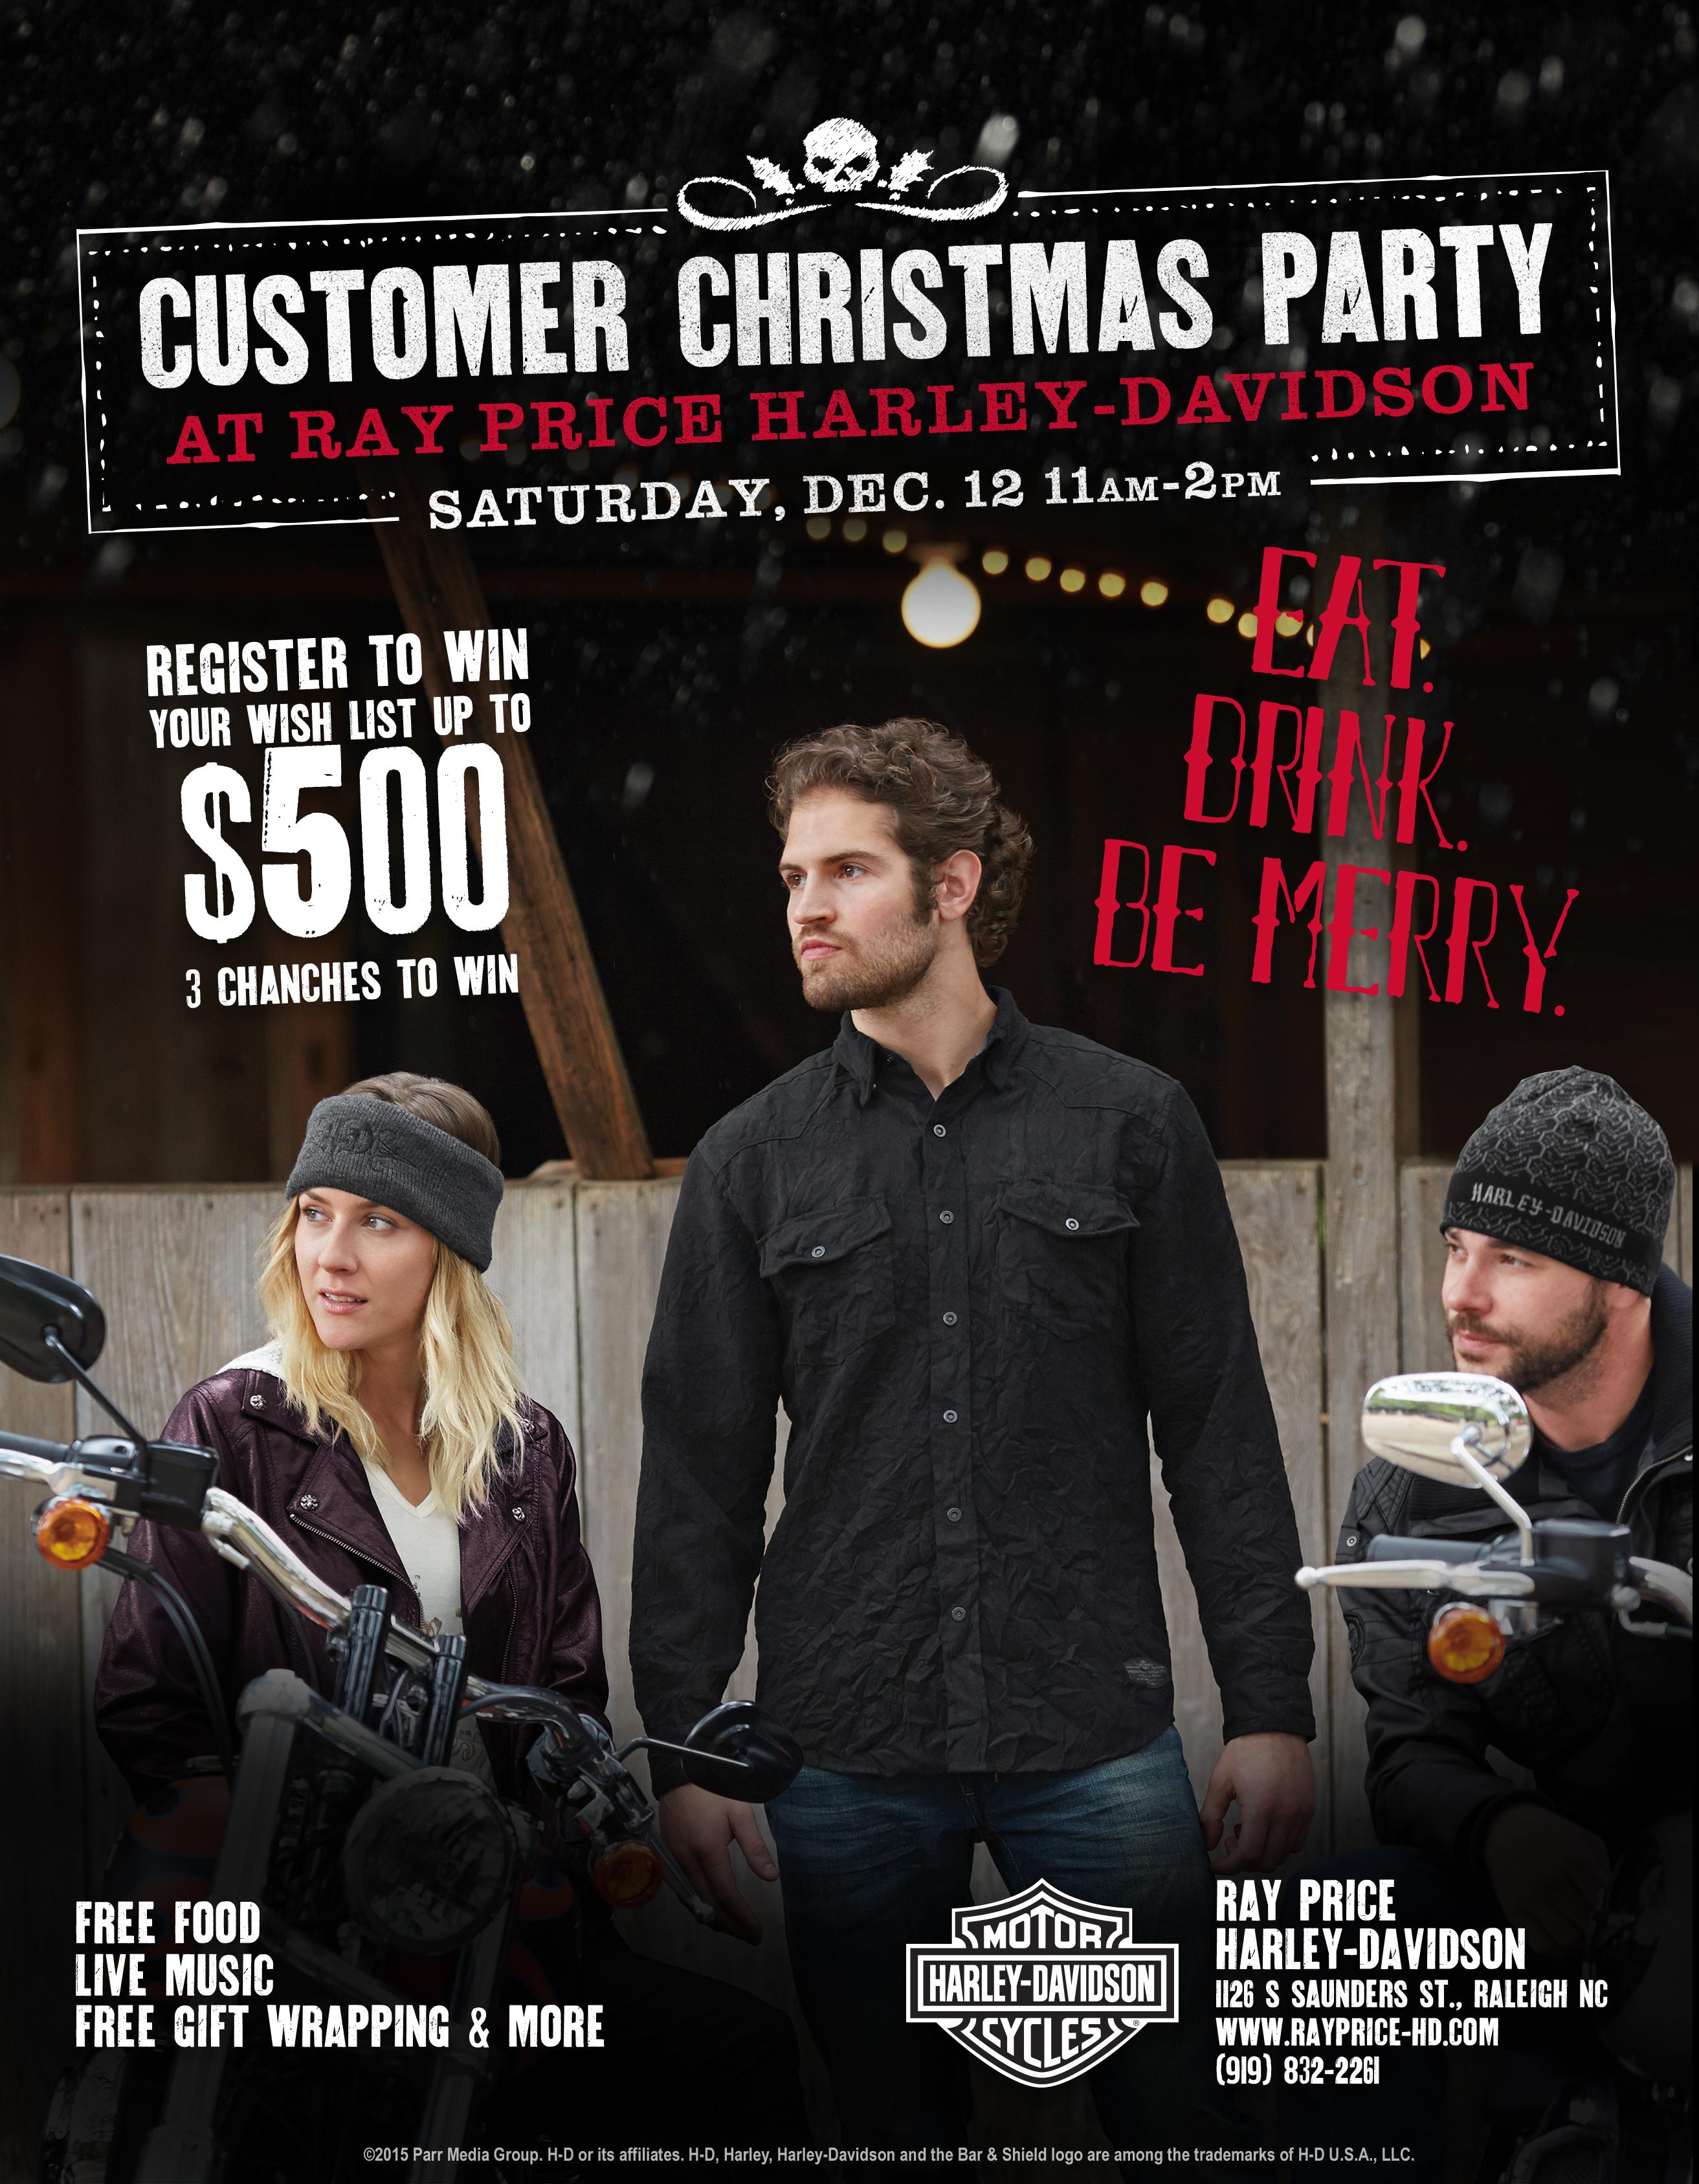 Customer Christmas Party